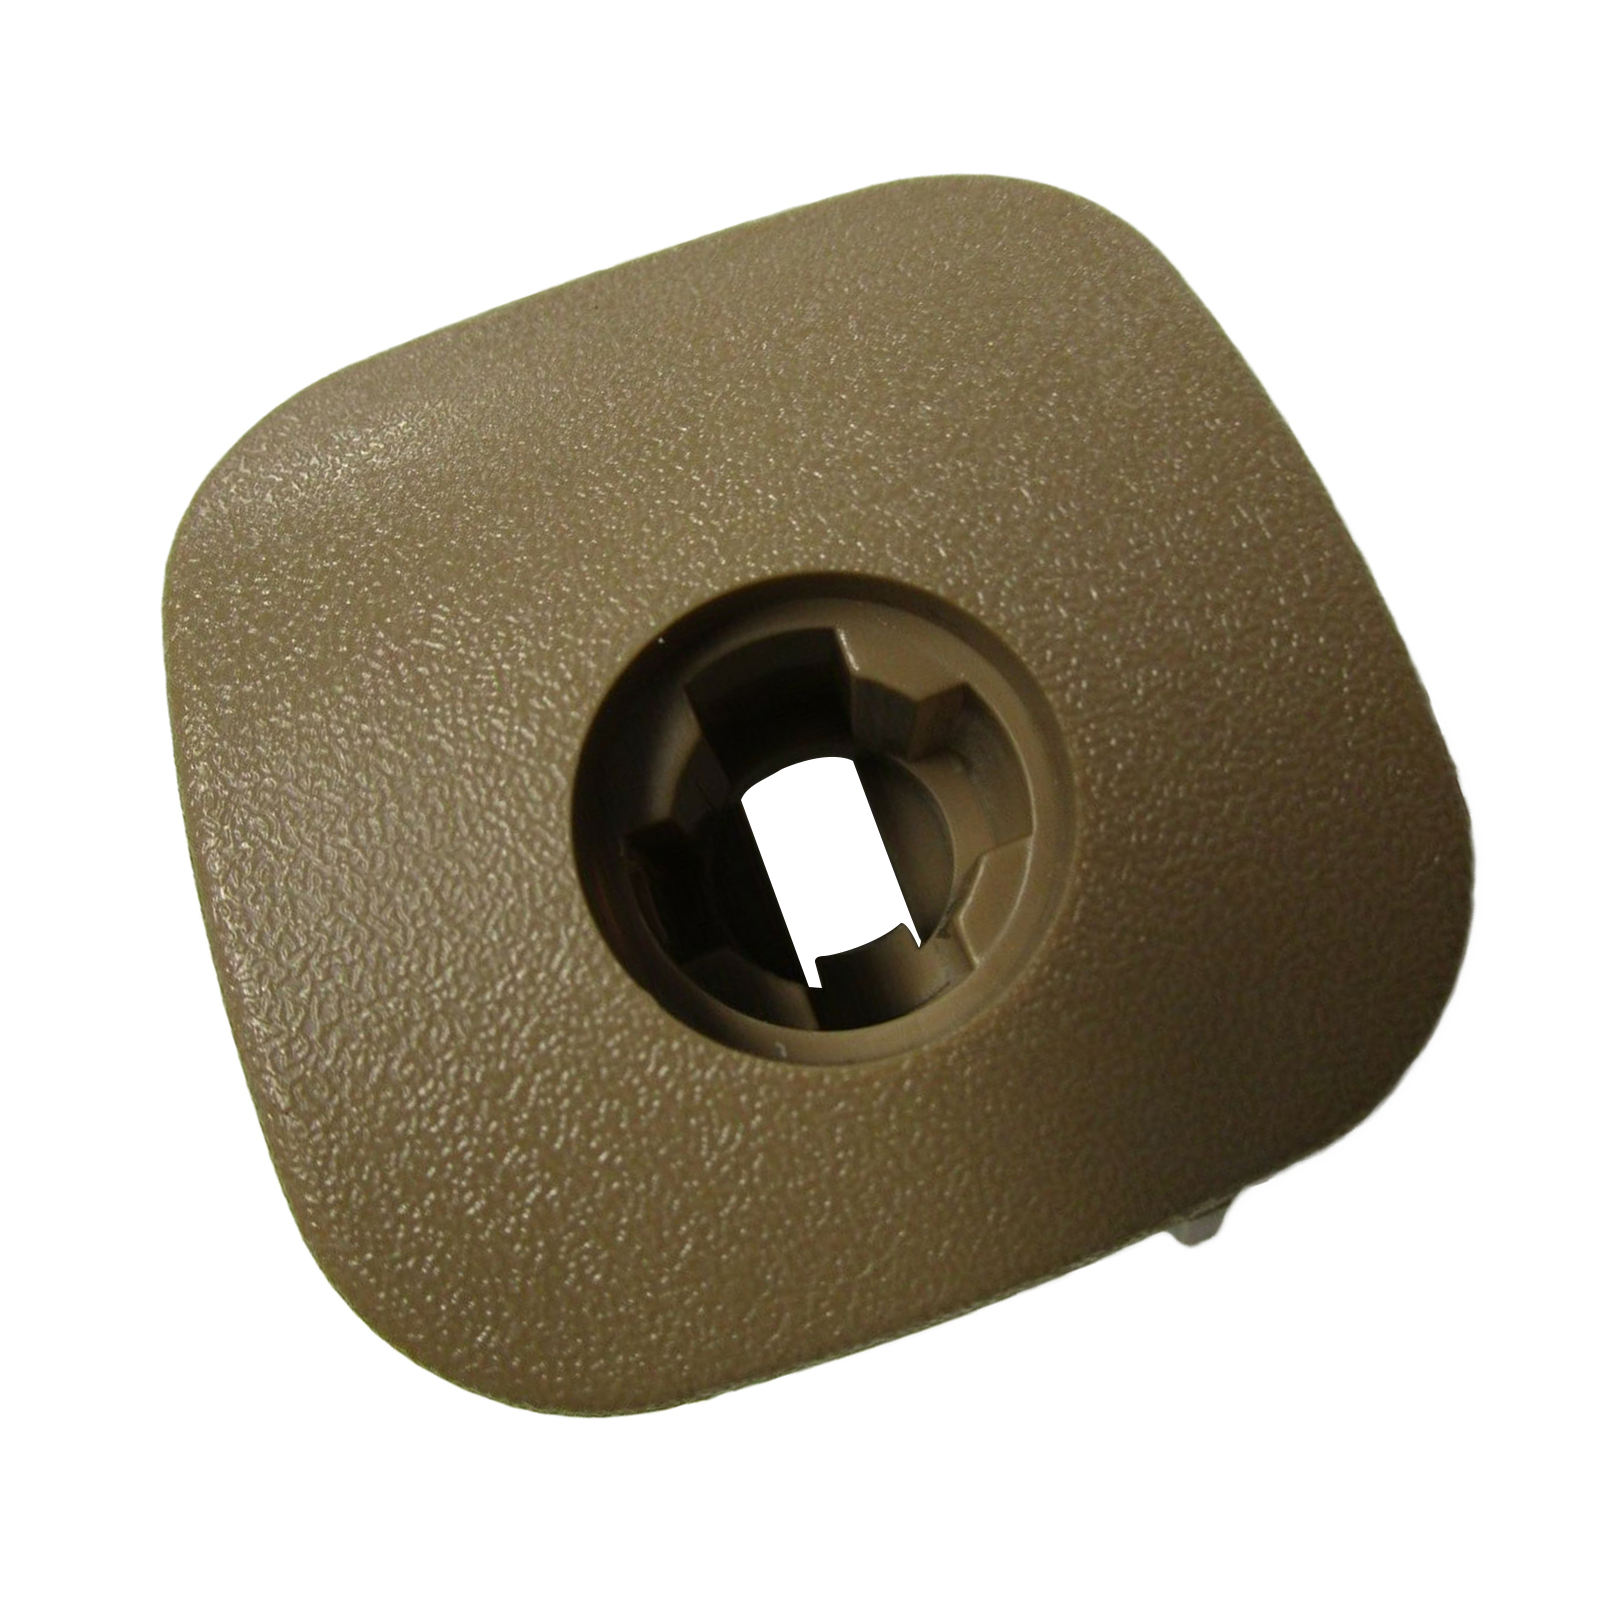 Glove Compartment Door Handle, 10328824, Brown Replaces ,Car Interior, Glove Box Lock Latch, Fit for Chevrolet Corvette C5.